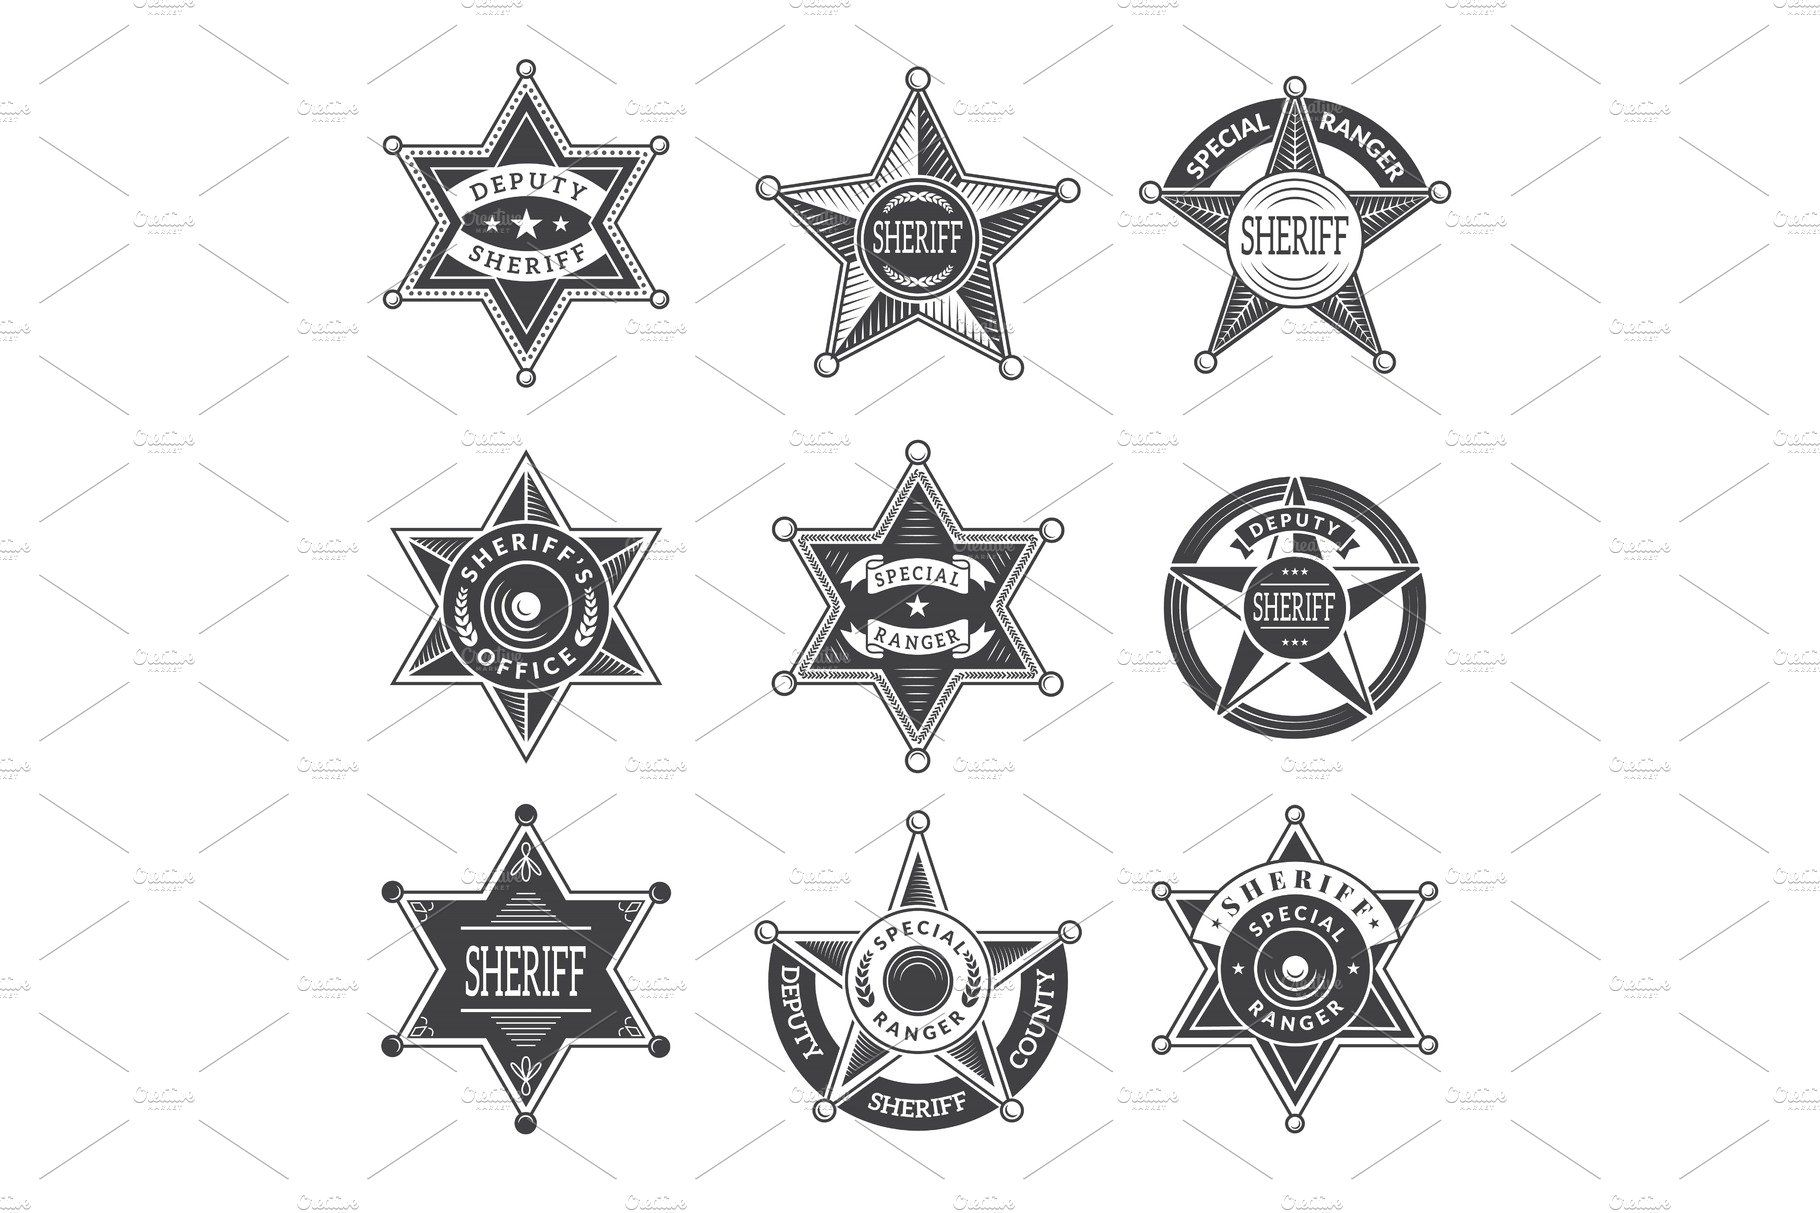 Sheriff stars badges. Western star by Onyx on